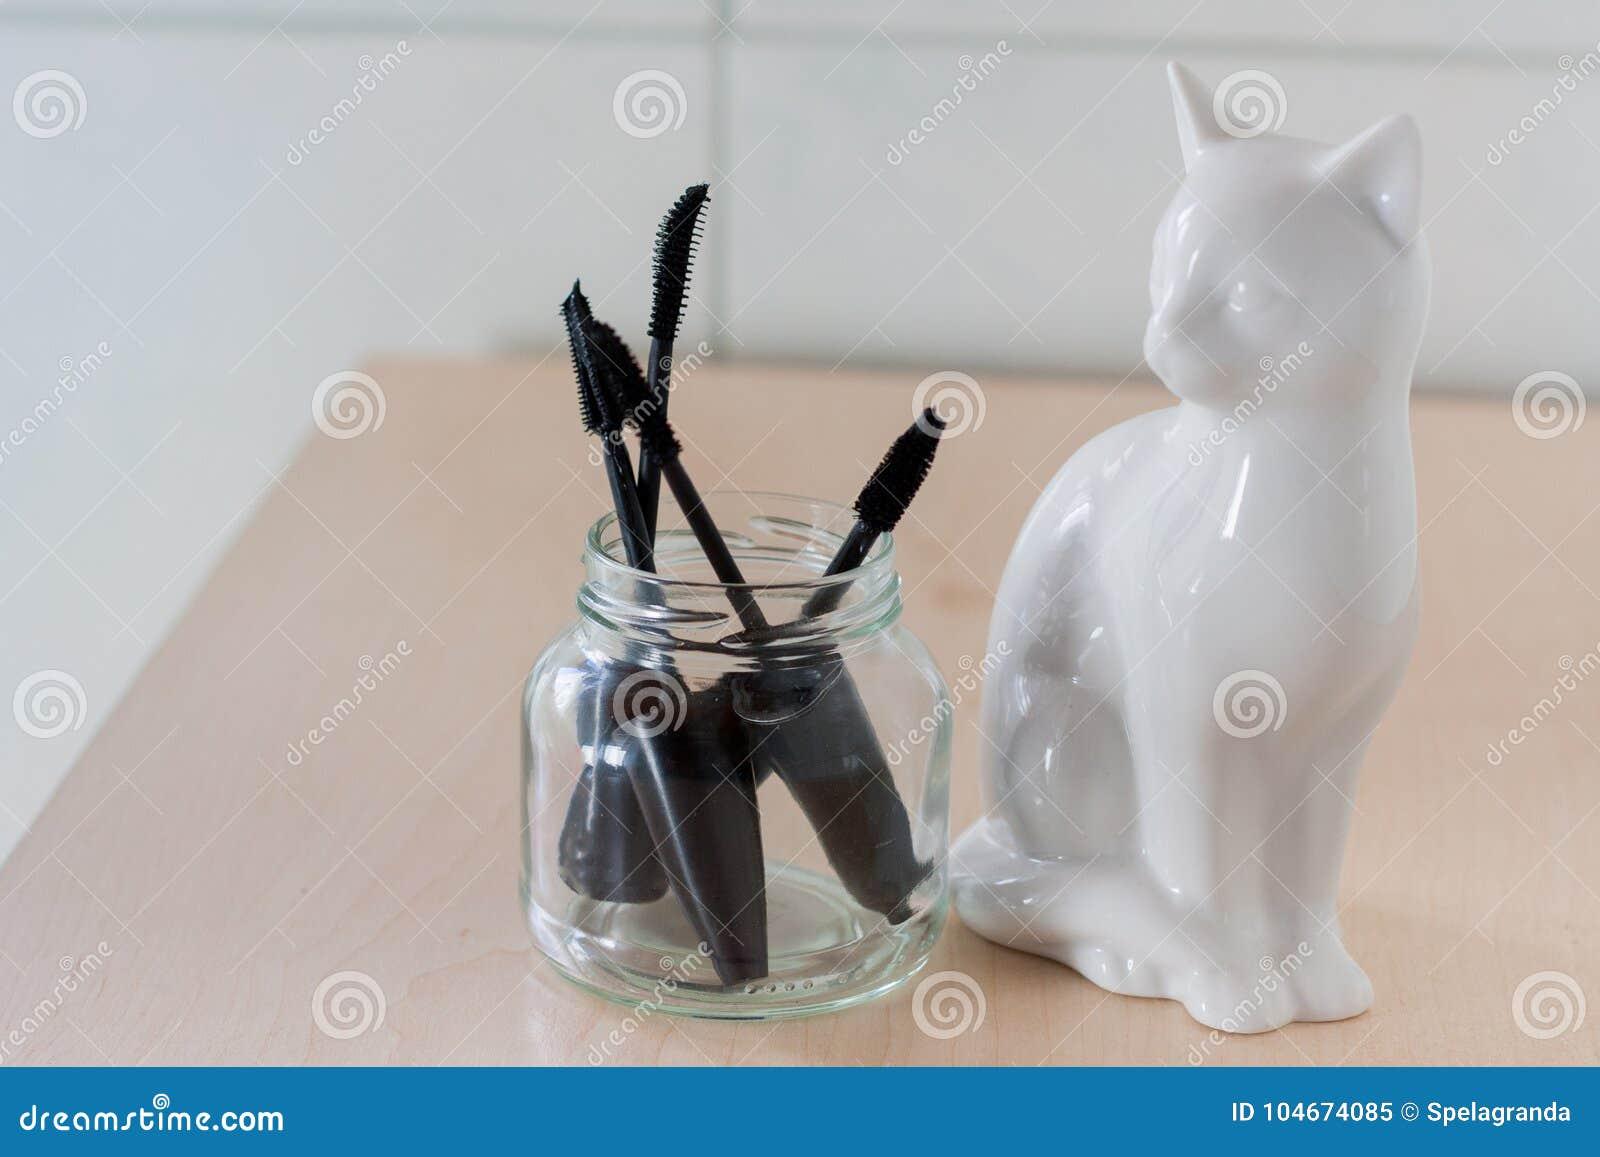 Mascara βούρτσες σε ένα βάζο γυαλιού